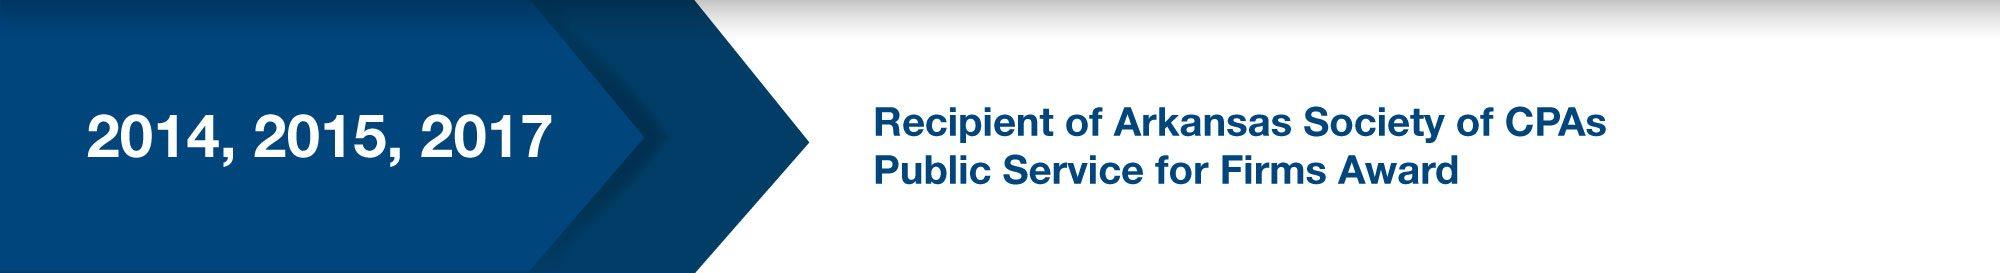 Recipient of ASCPA Public Service for Firms Award (2012, 2015)